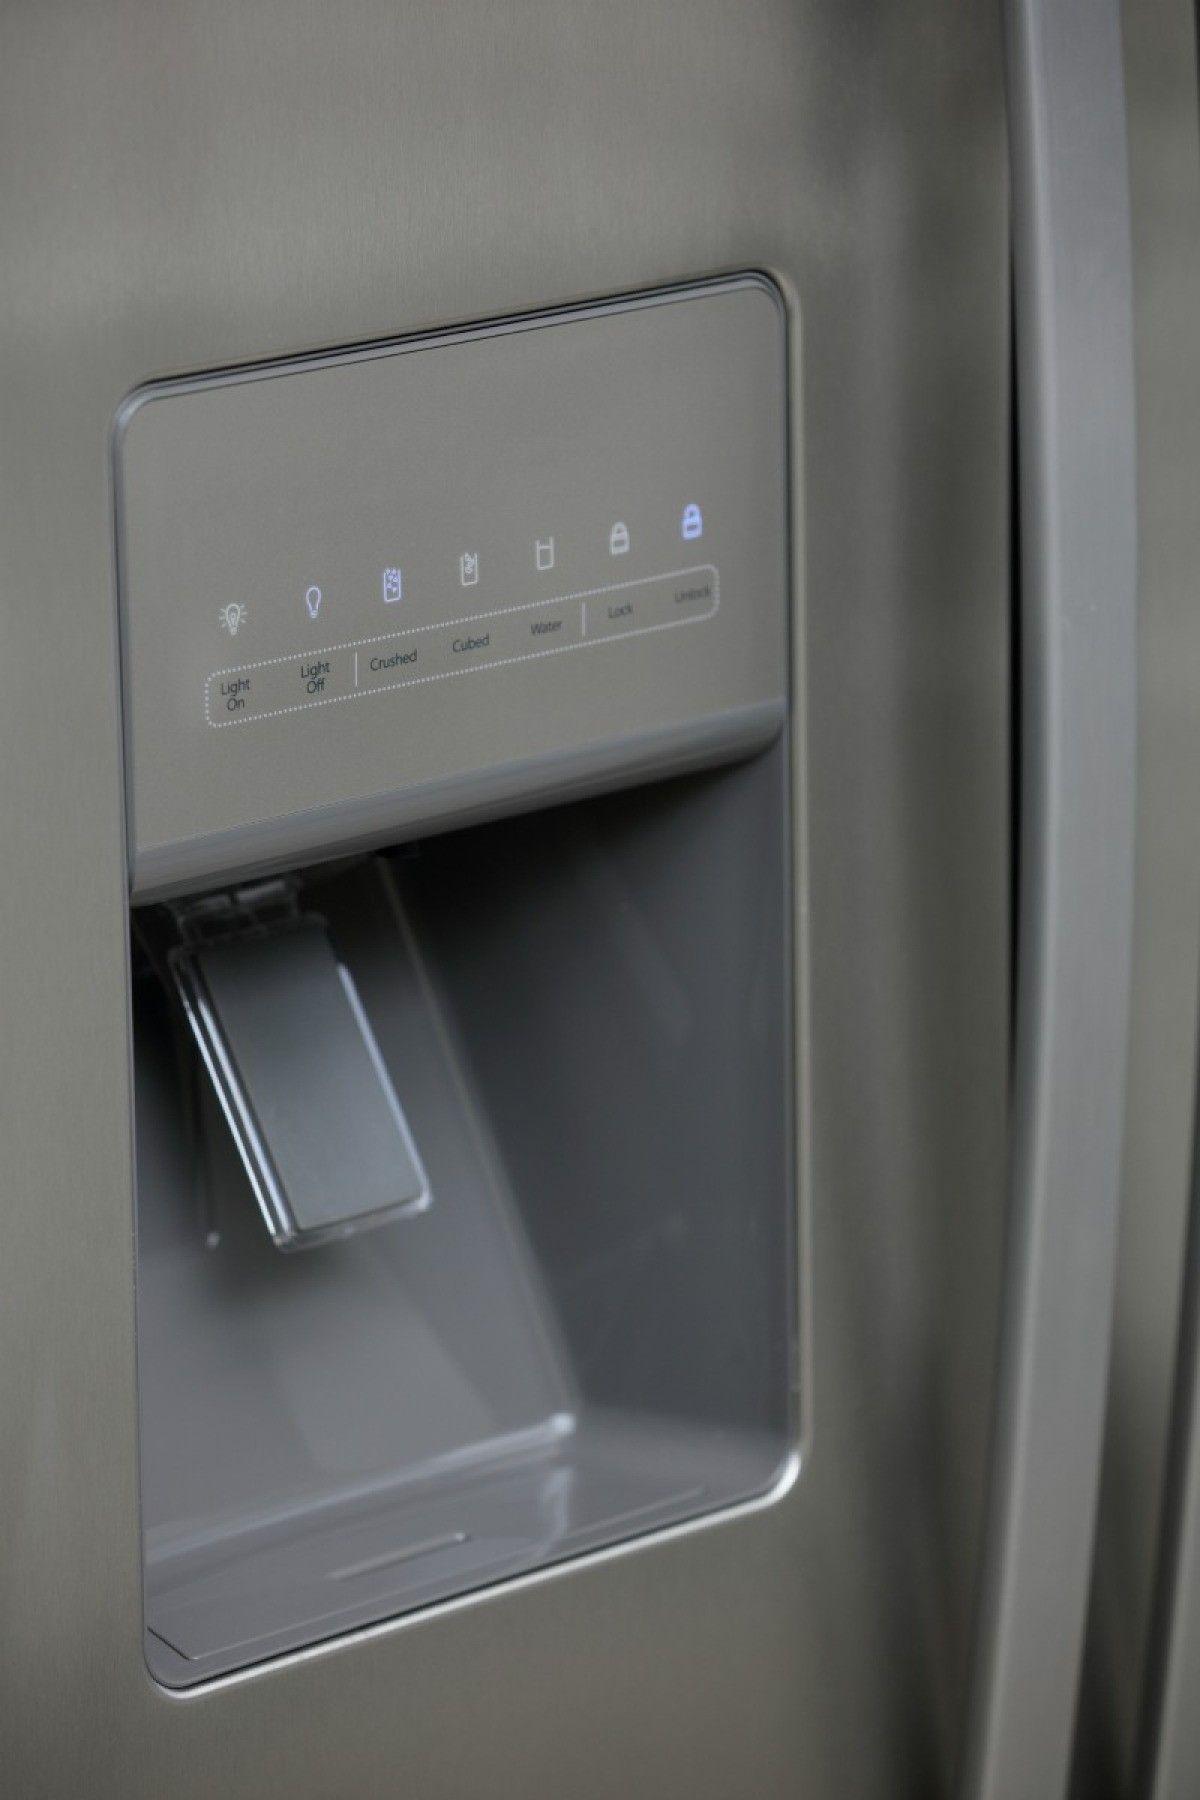 Awesome kitchenaid refrigerator ice maker sensor not